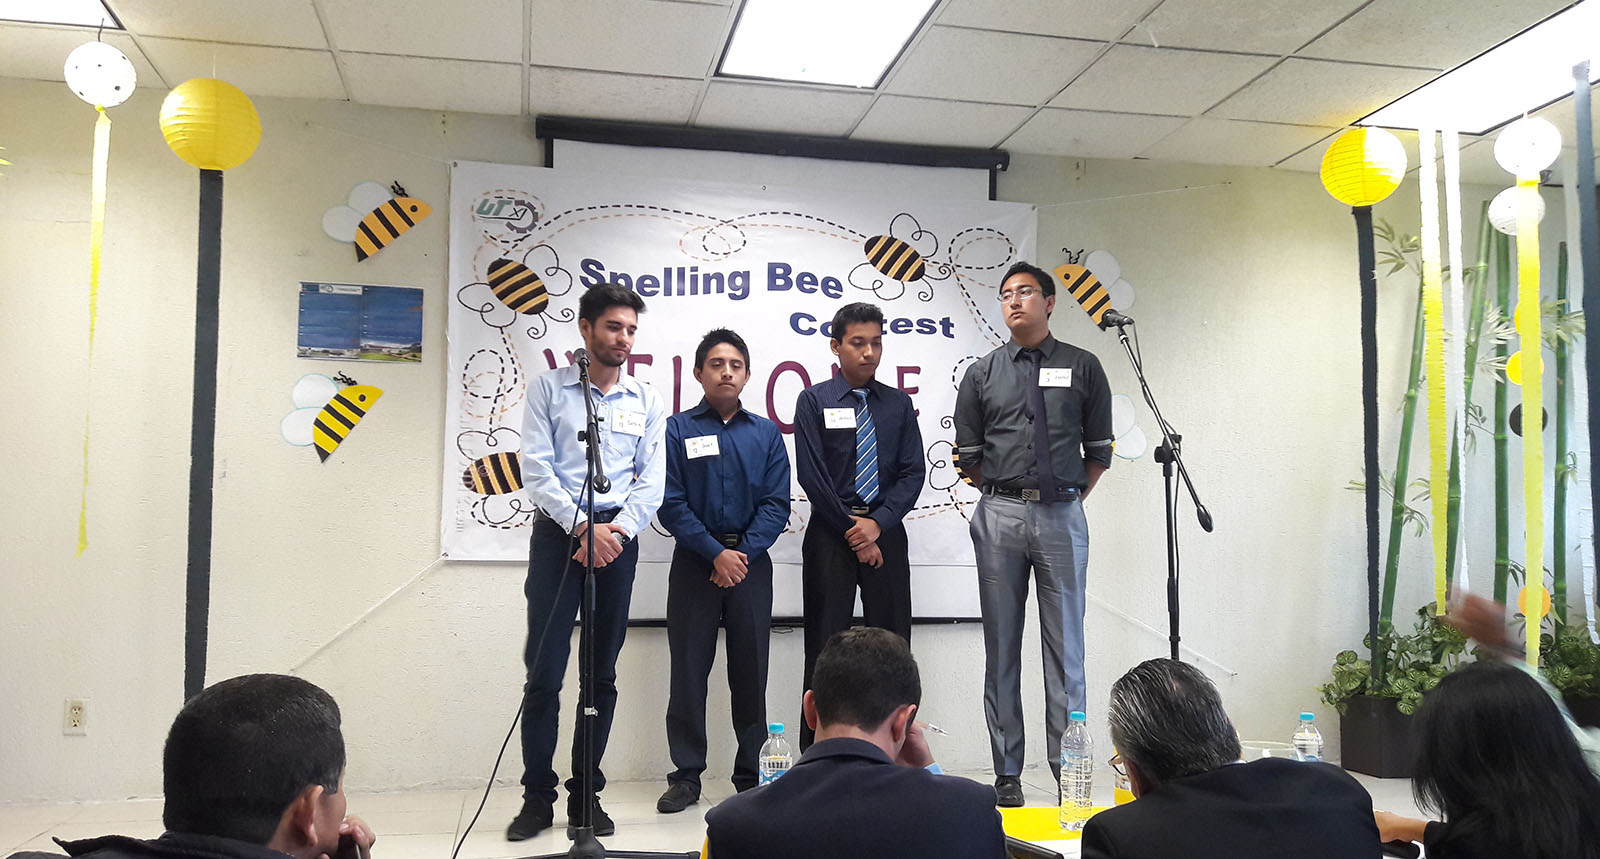 Spelling Bee Contest